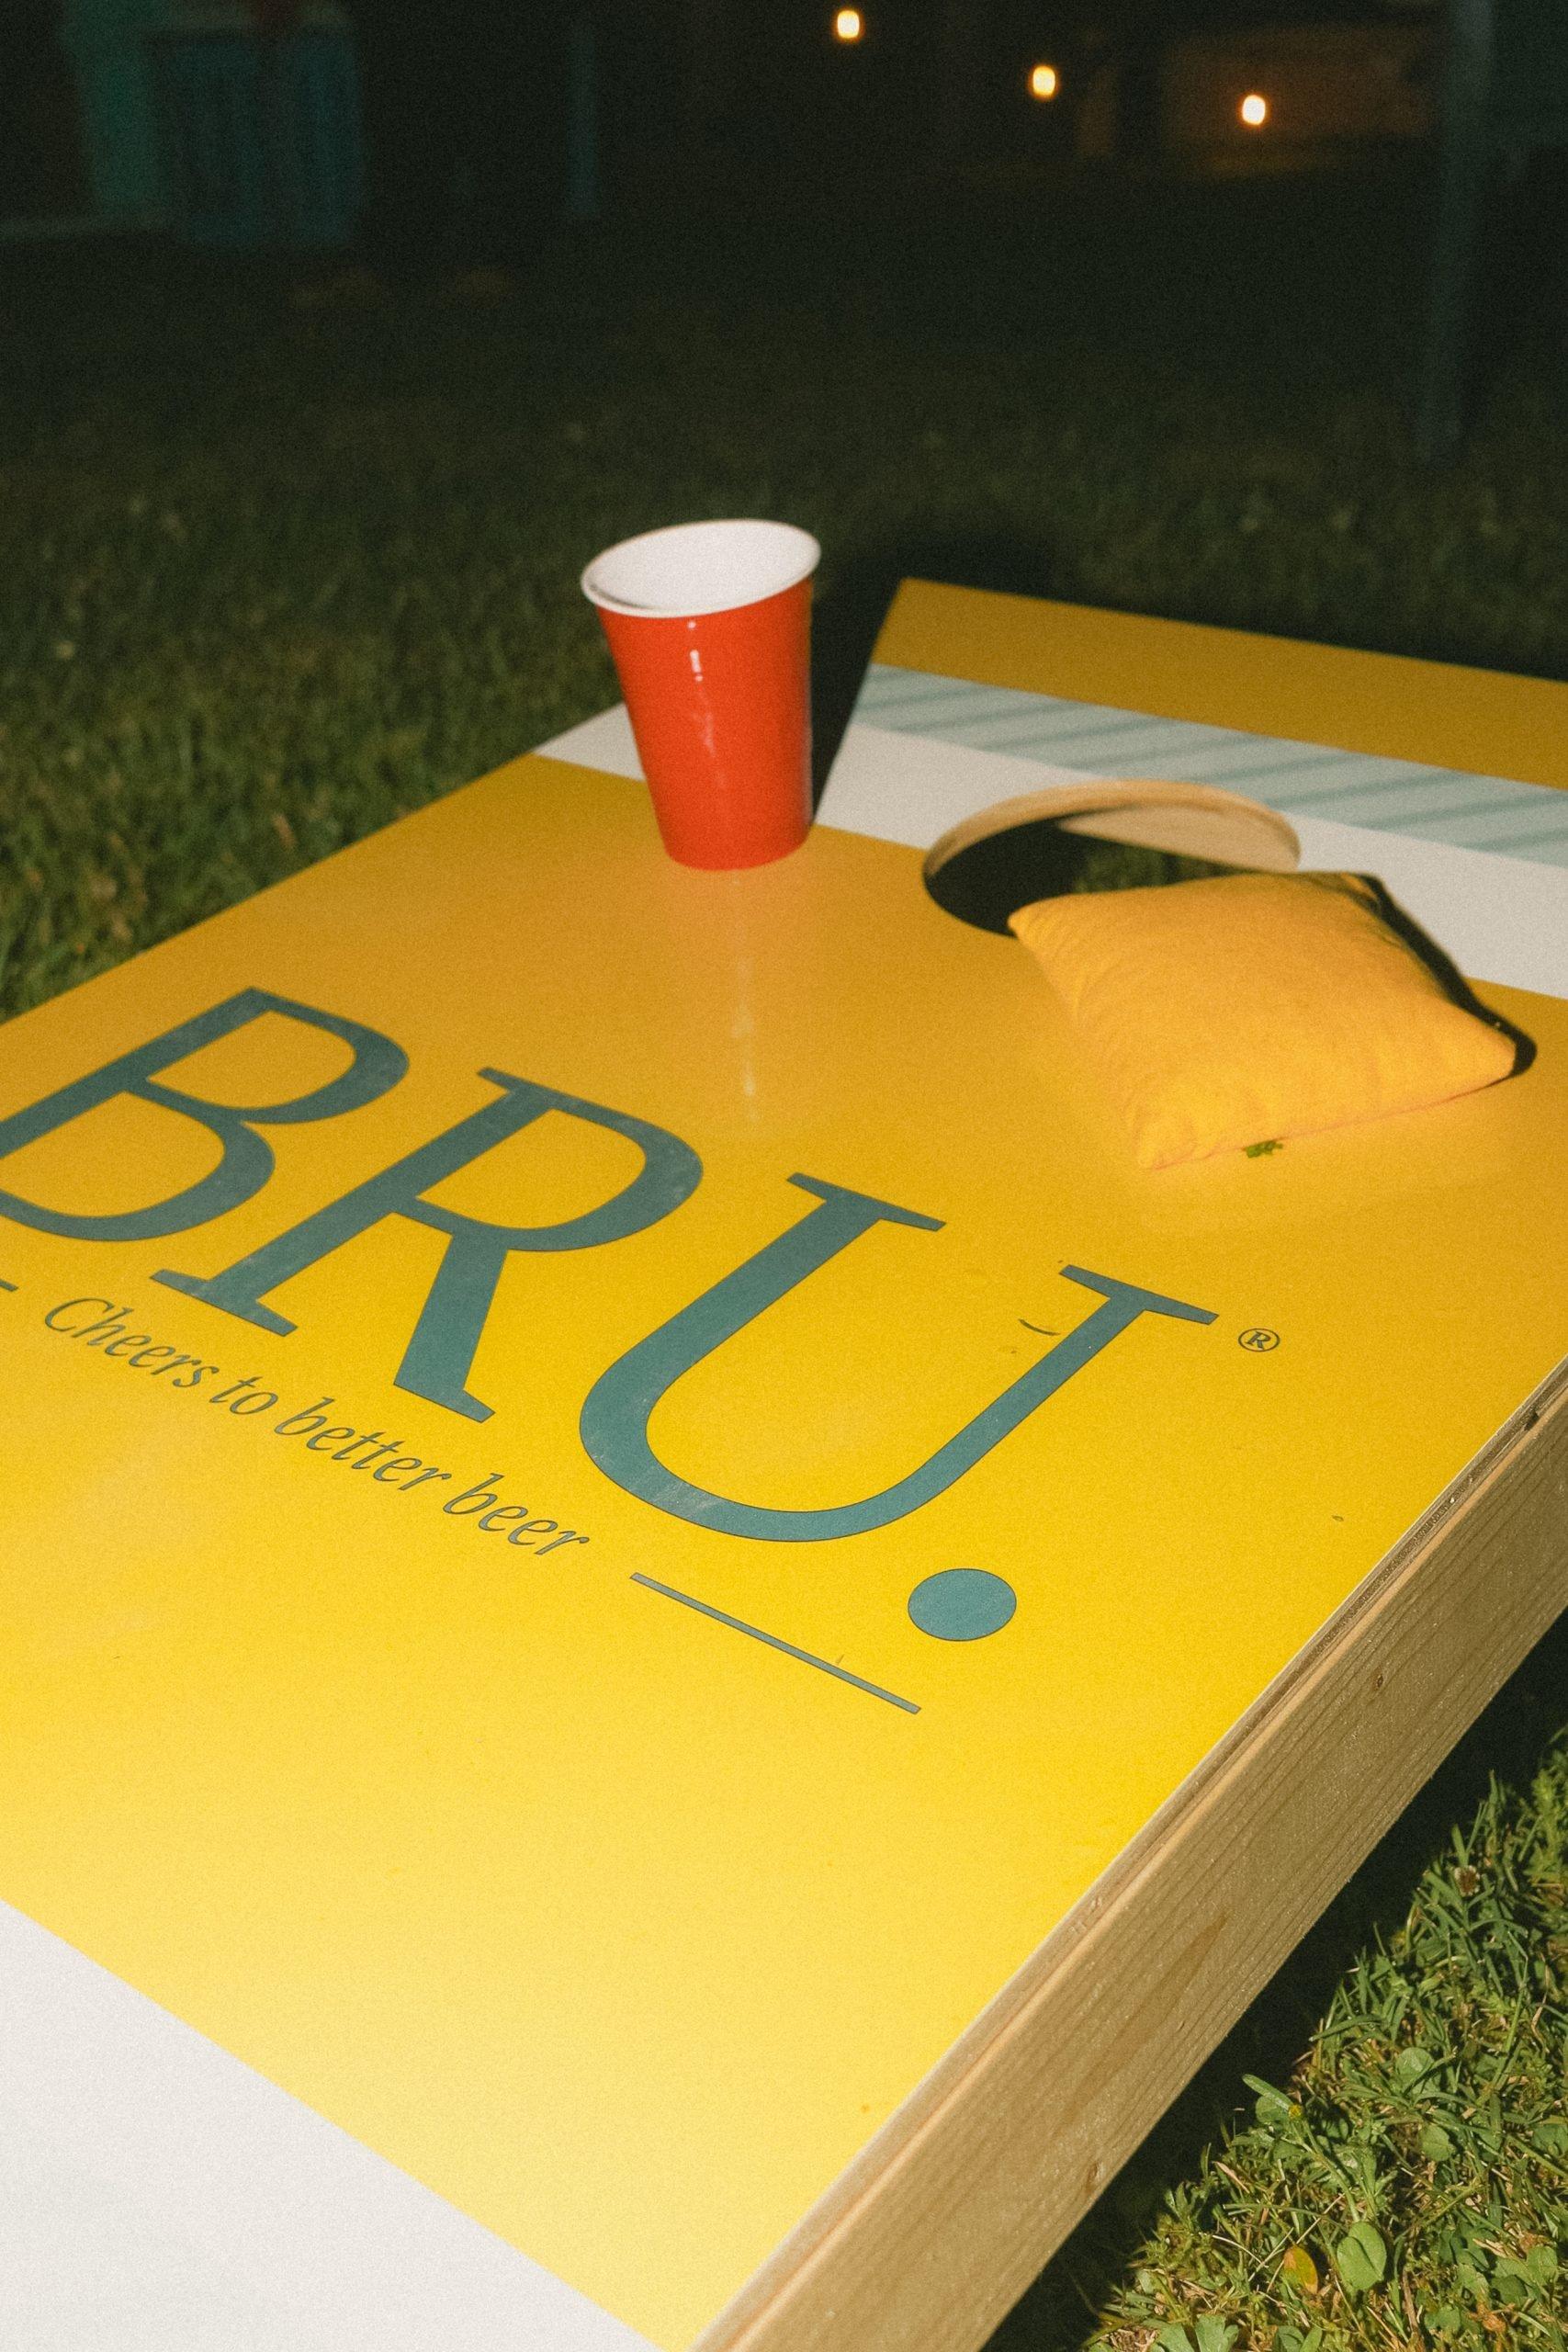 BRU Beer Cornhole Board